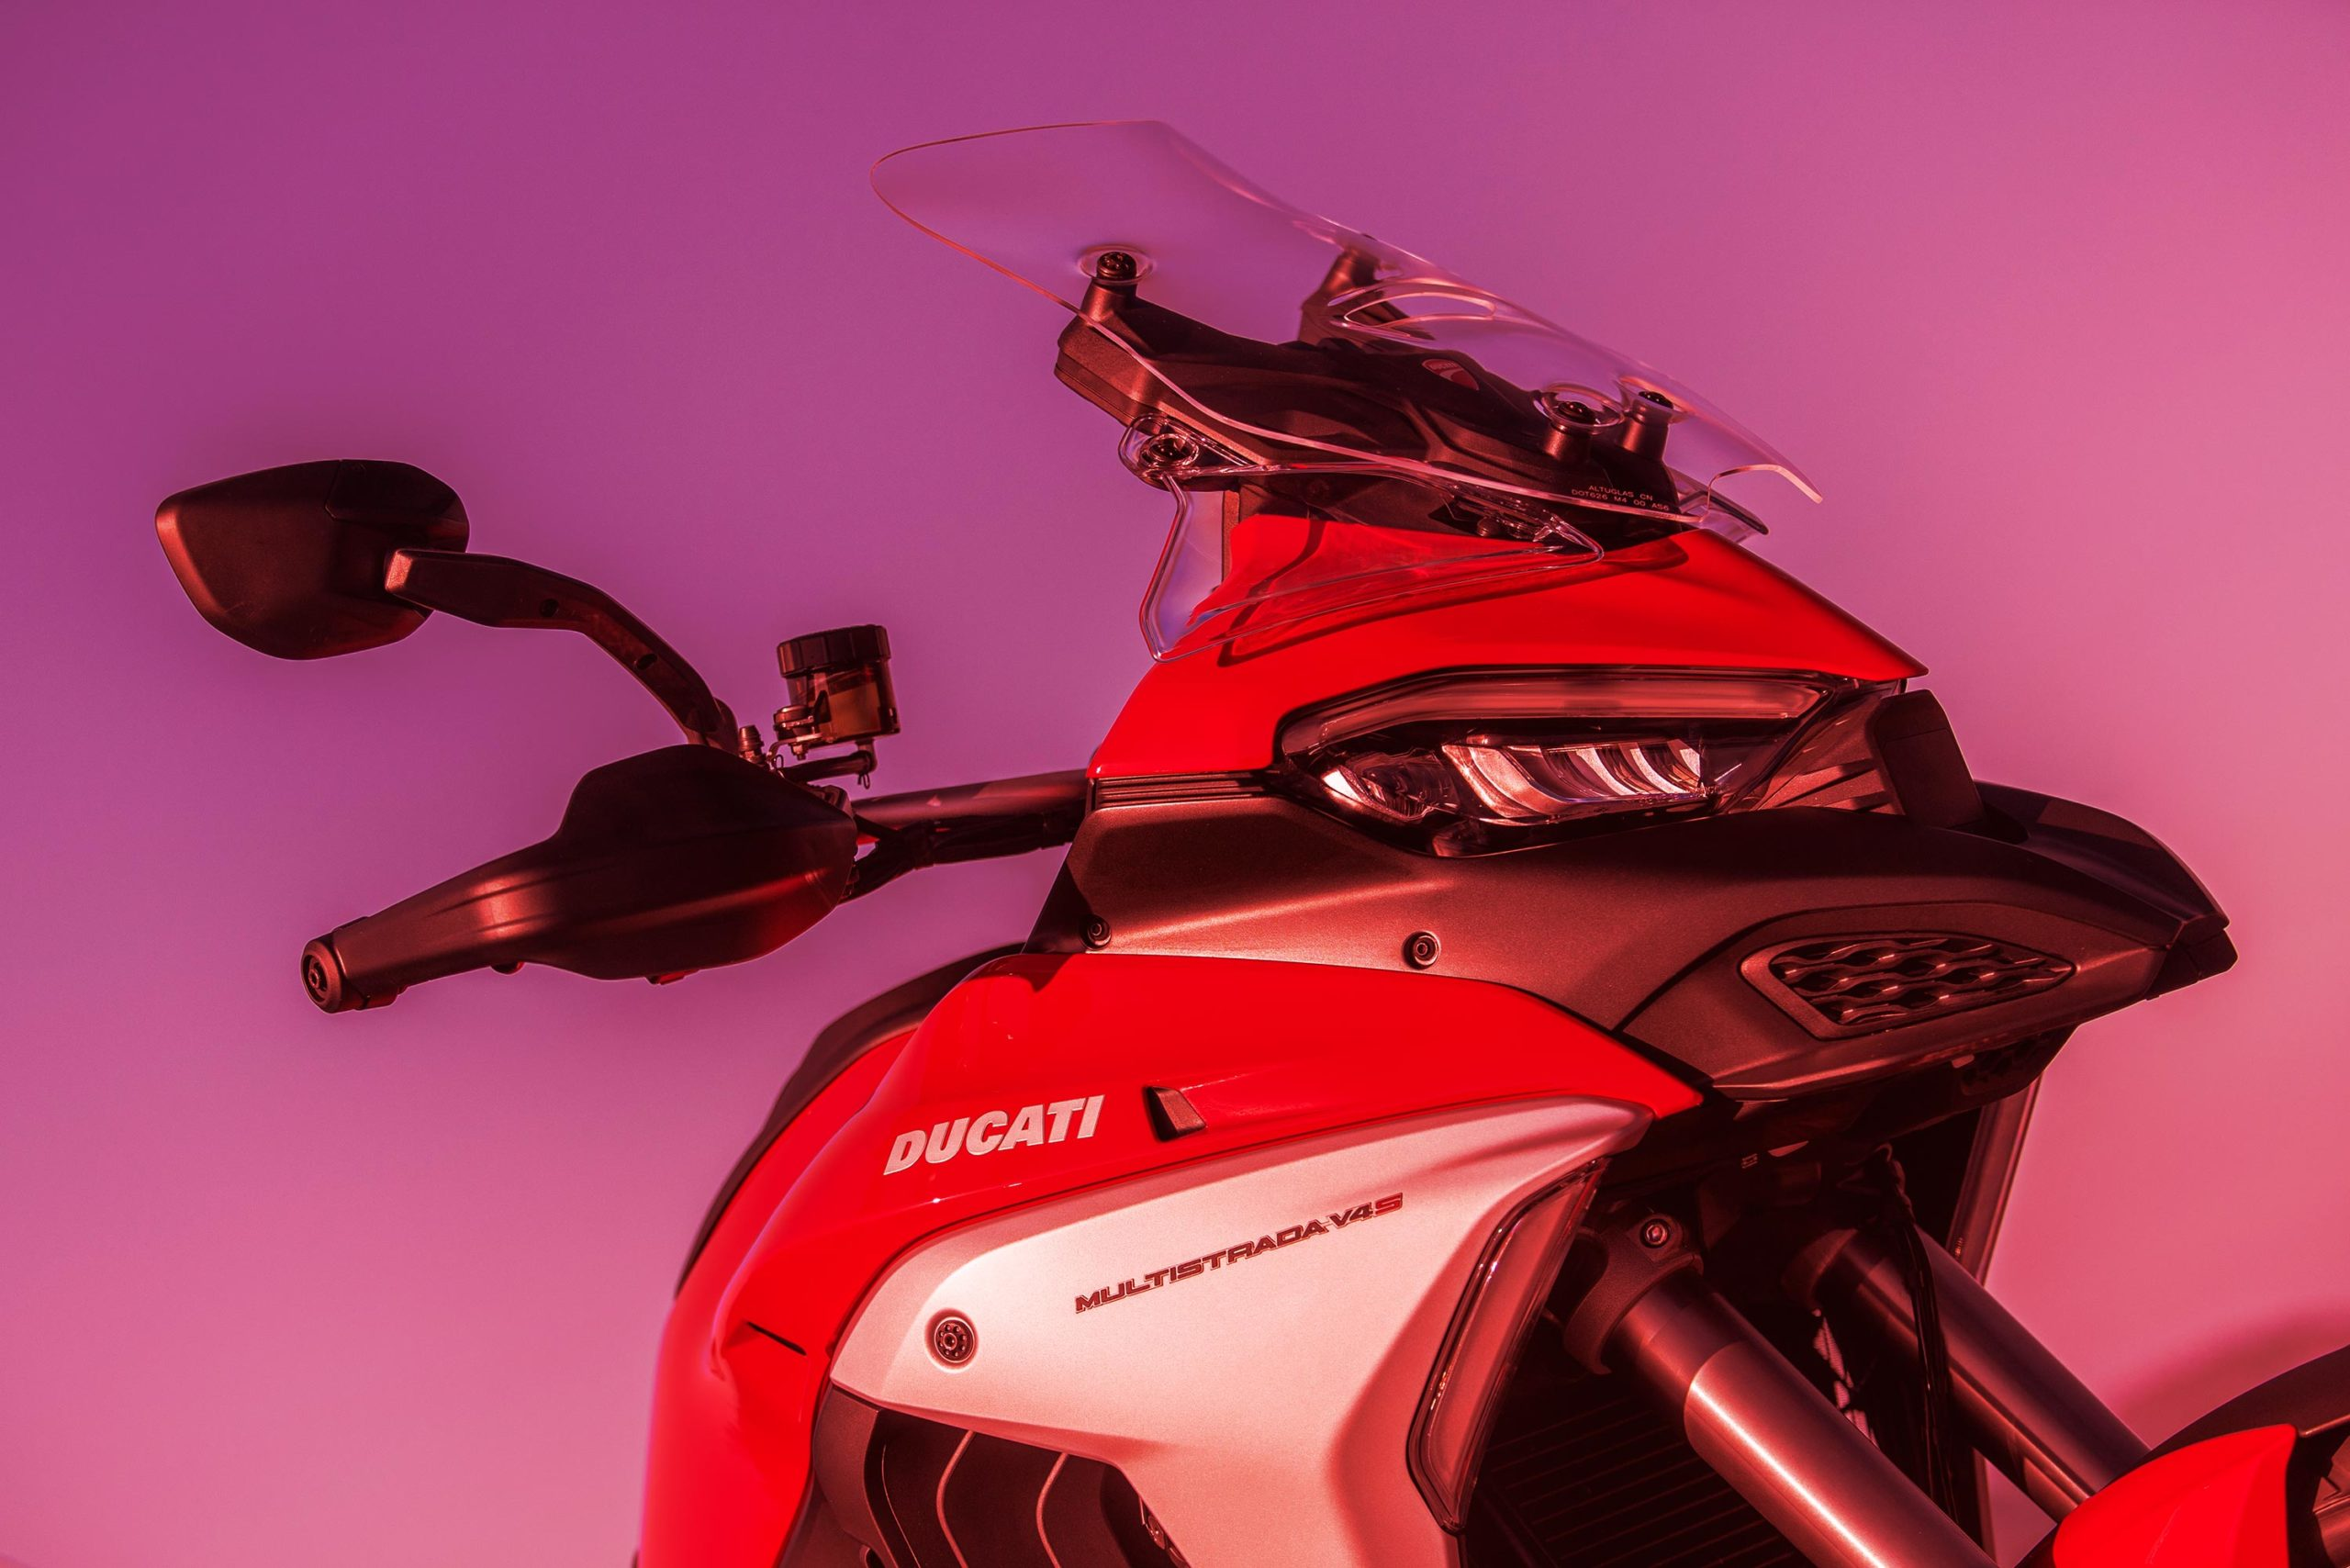 17-дюймовые передние колеса Ducati Multistrada V4 Spotted